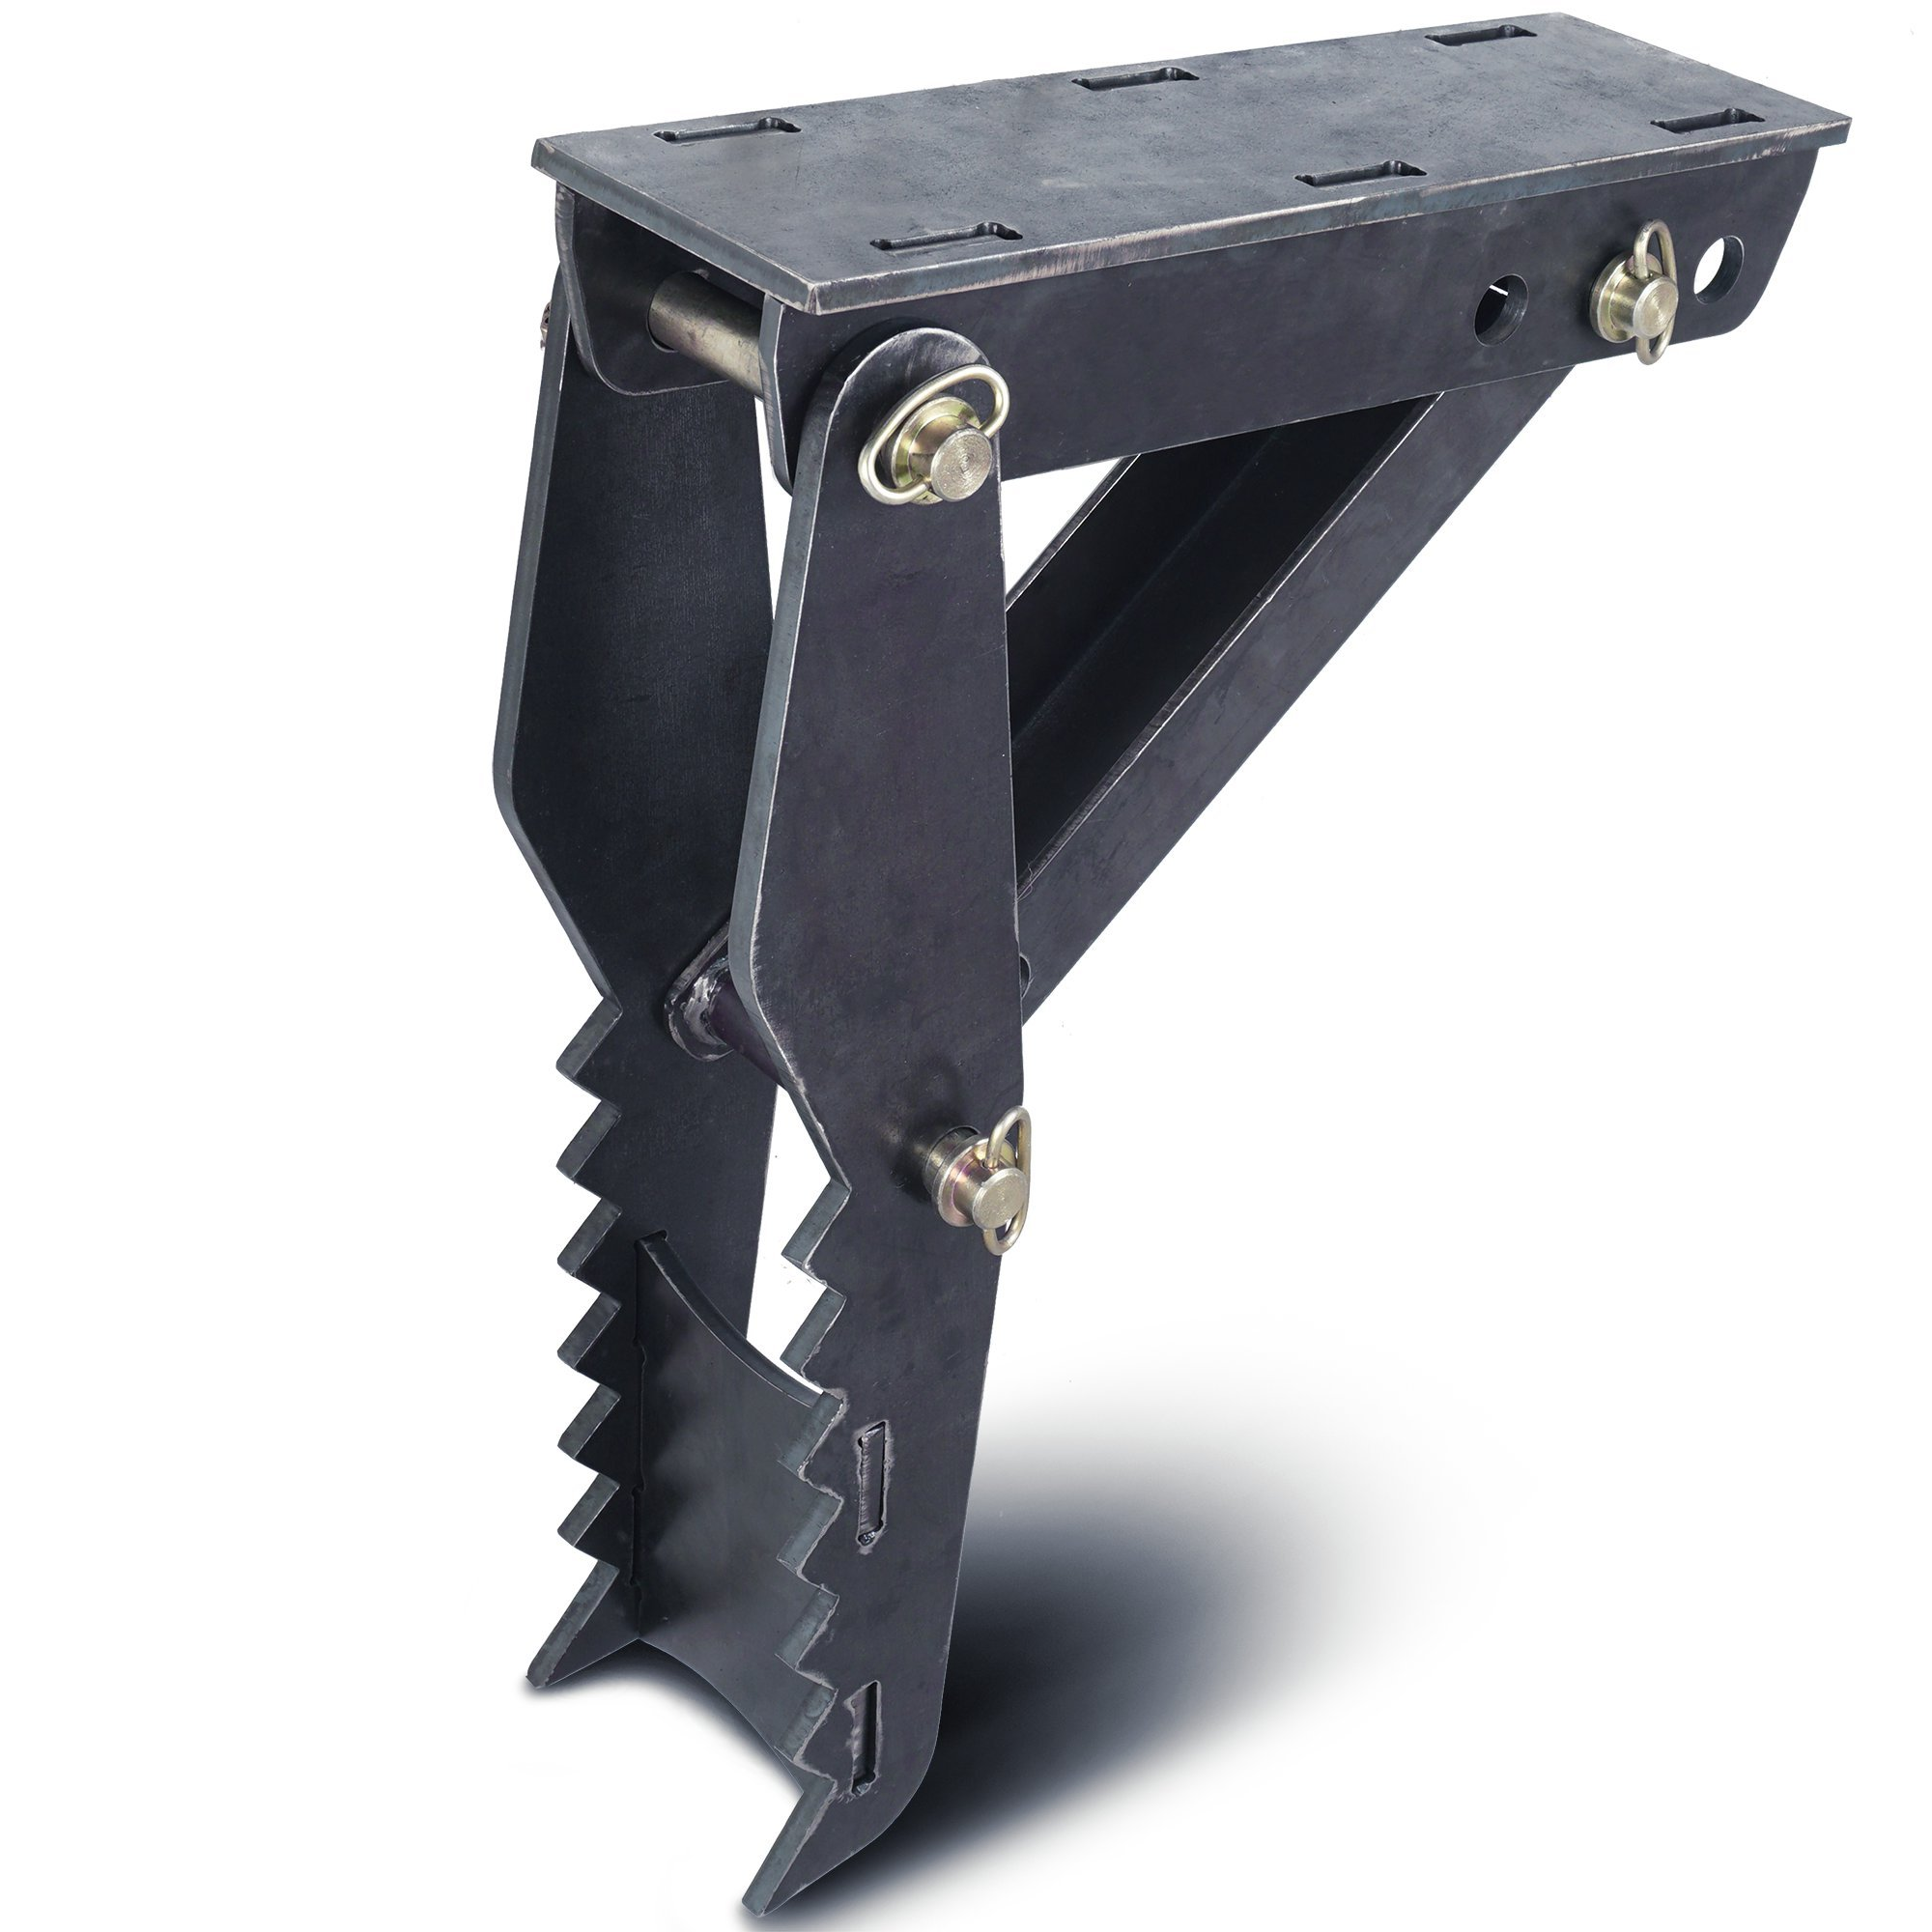 DIY 24'' Weld On Backhoe Thumb Hoe Clamp .5'' Steel Plate Assembly CNC Plasma Cut